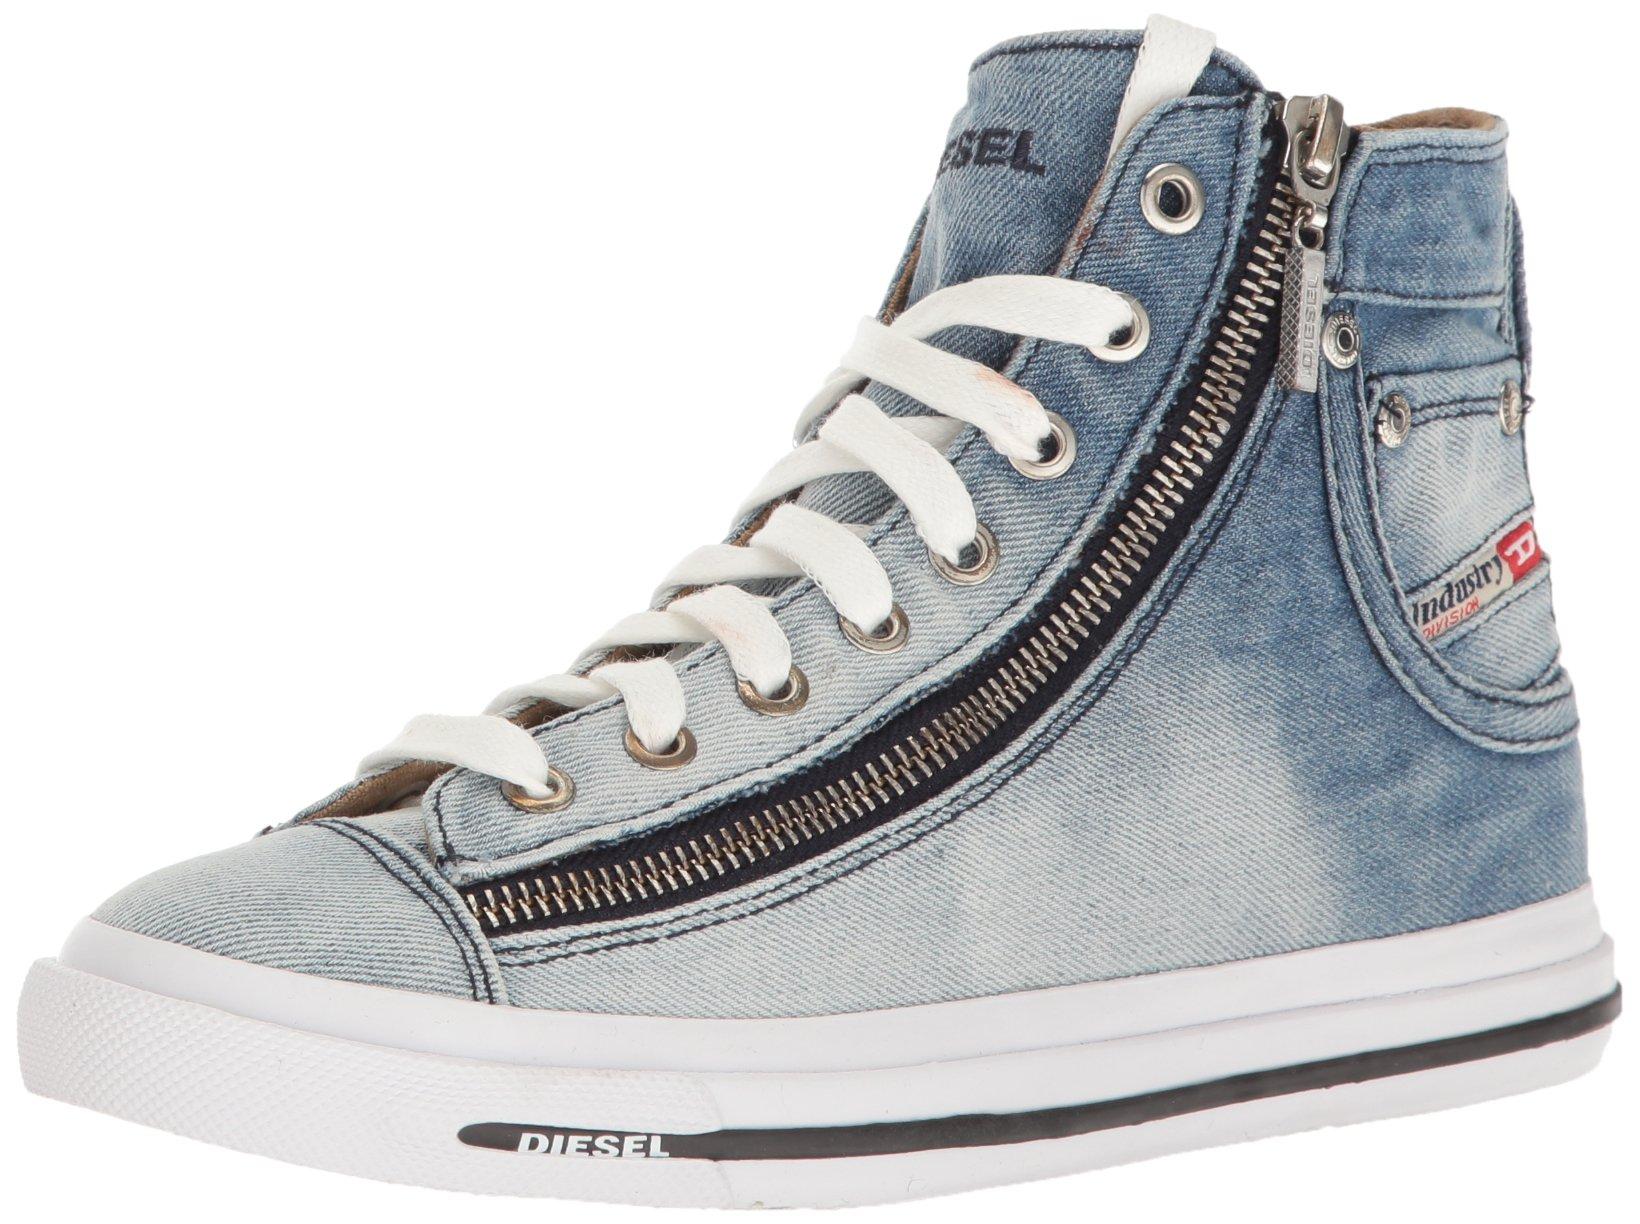 Diesel Women's Magnete Expo-Zip W Fashion Sneaker, Indigo, 8 M US